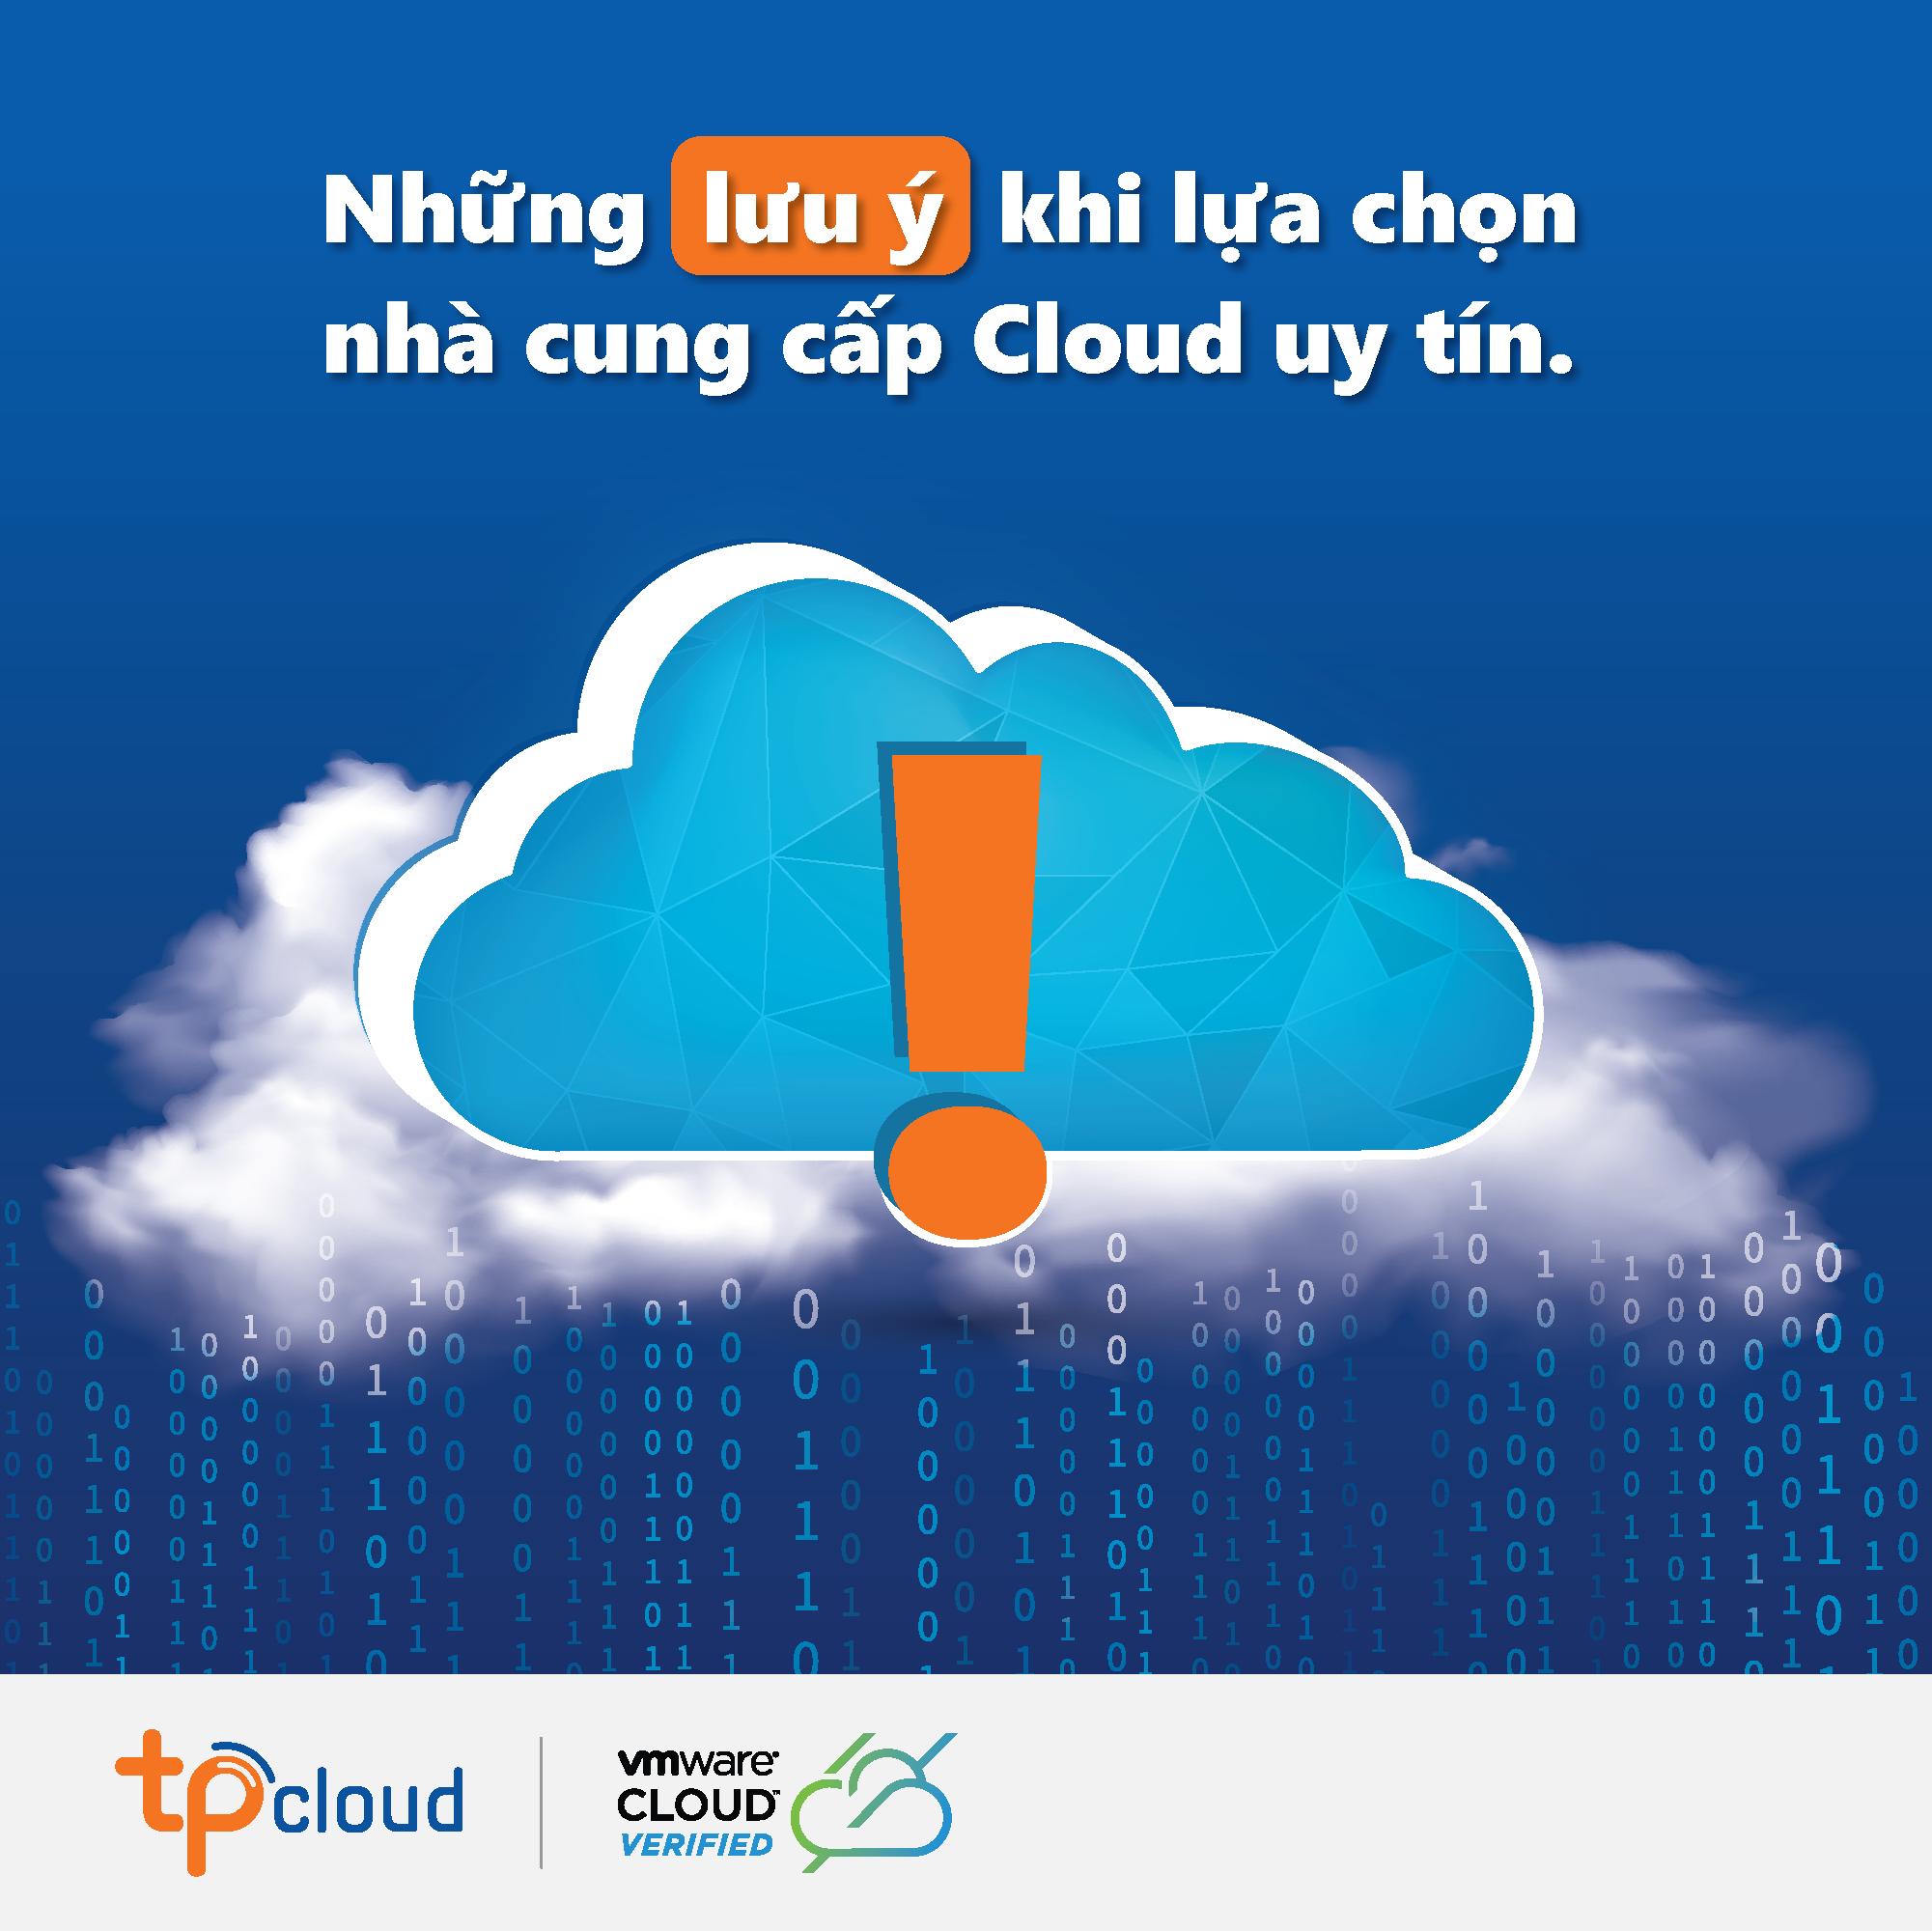 nhung-luu-y-khi-lua-chon-nha-cung-cap-cloud-uy-tin